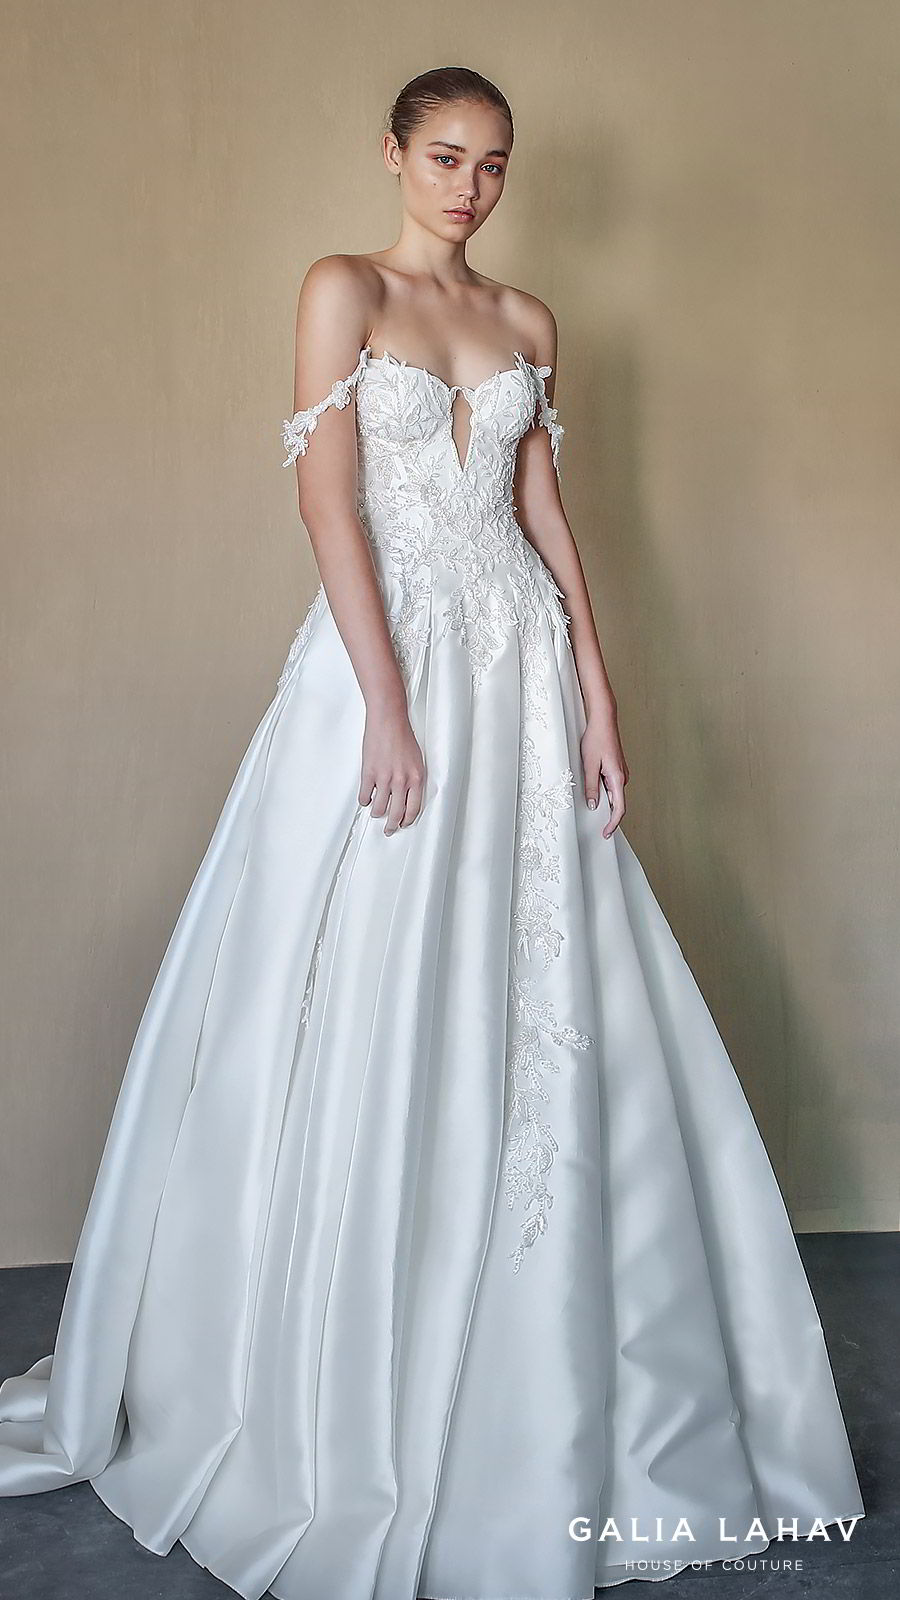 galia lahav fall 2019 bridal off shoulder lace straps sweetheart neckline keyhole embellished bodice ball gown wedding dress romantic elegant (aida) mv